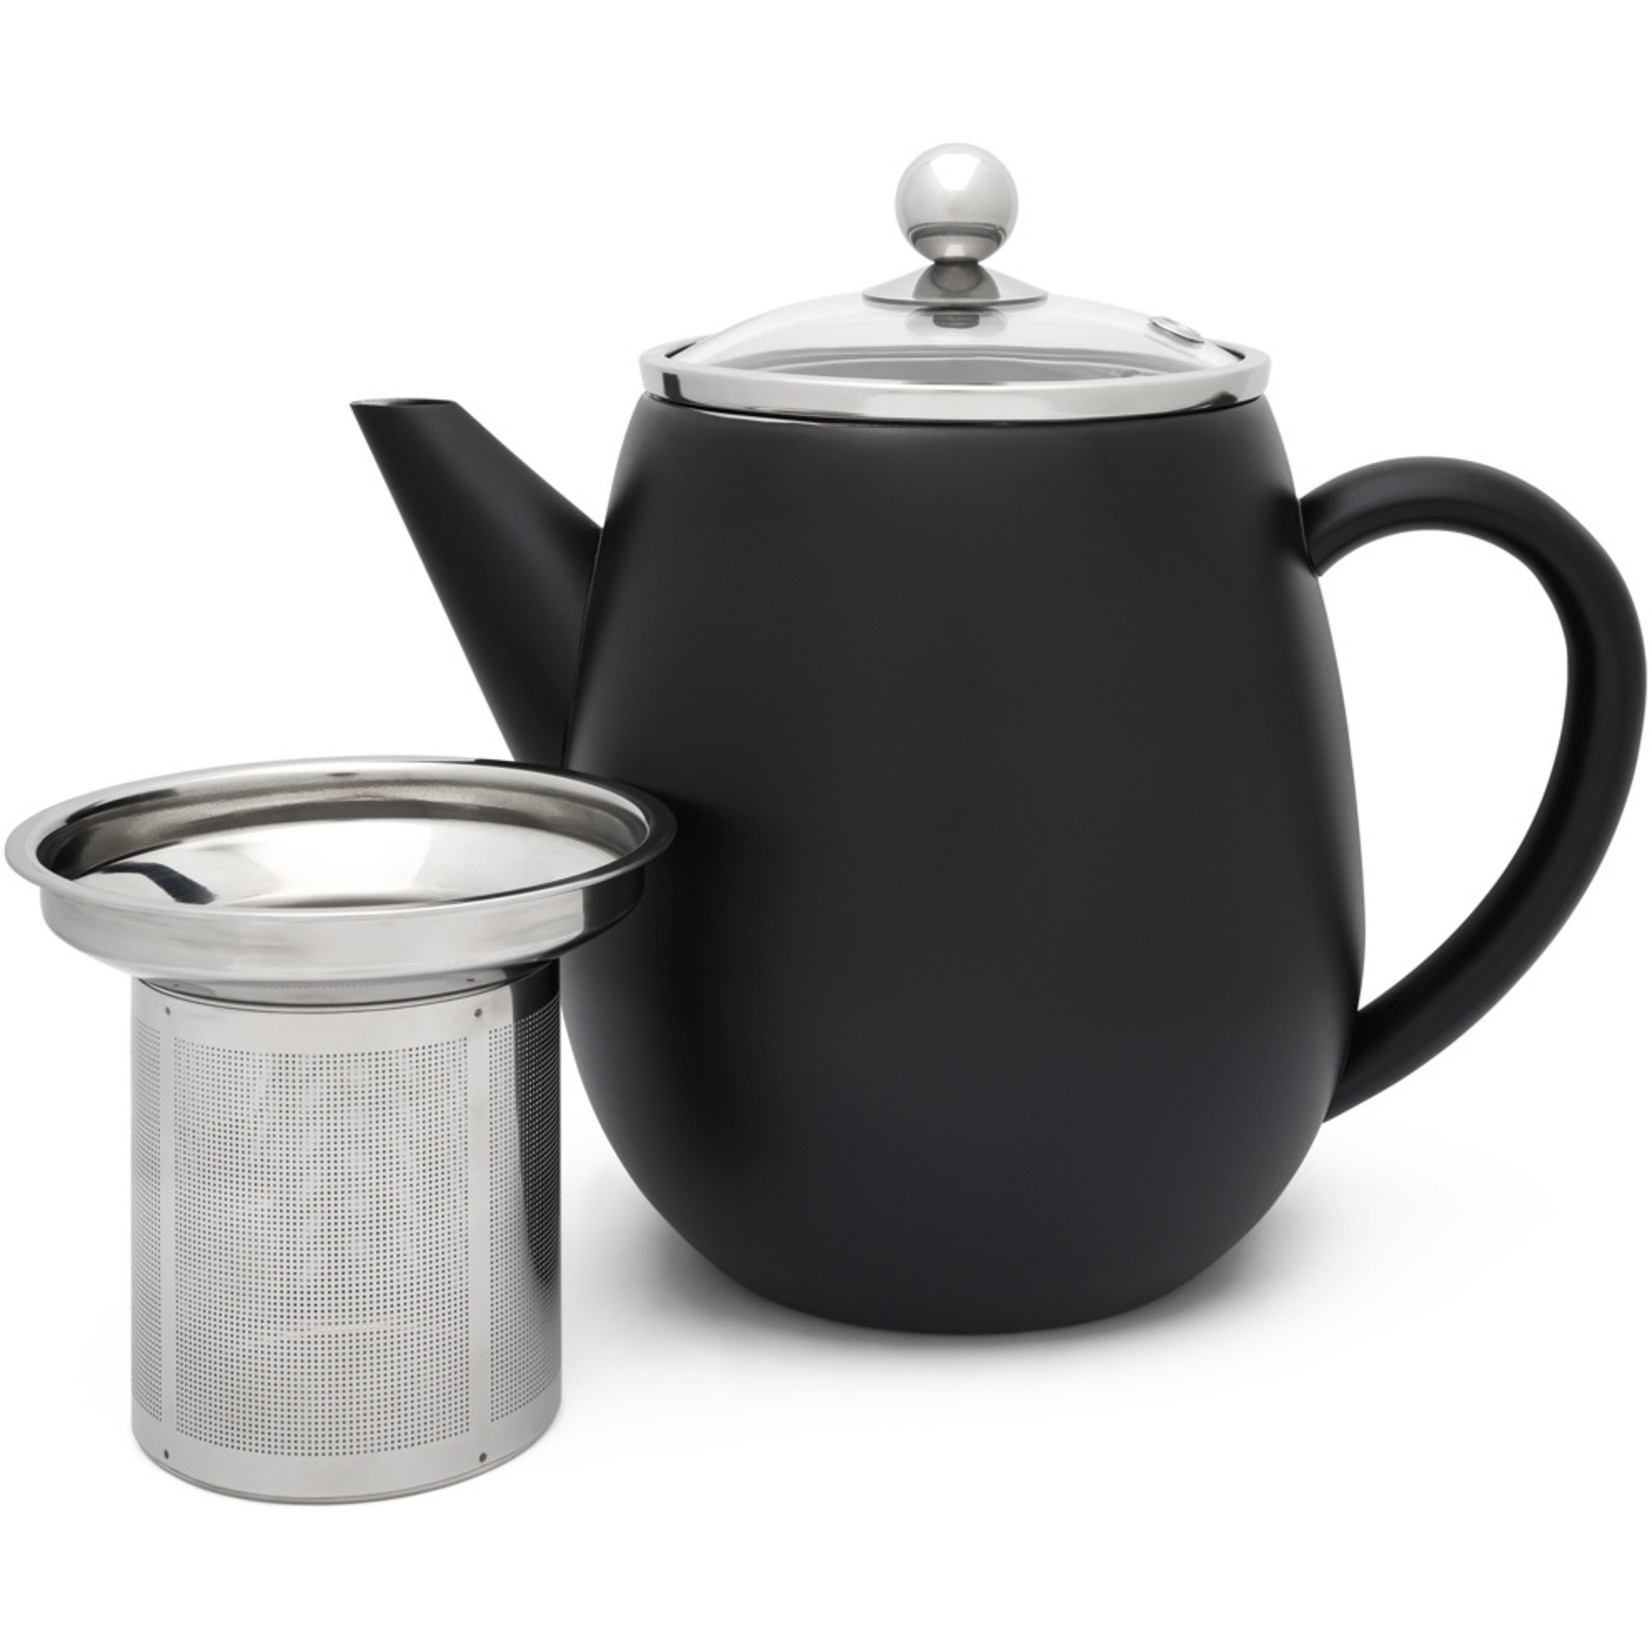 Bredemeijer Bredemeijer Duet Eva theepot 1,1 liter, zwart